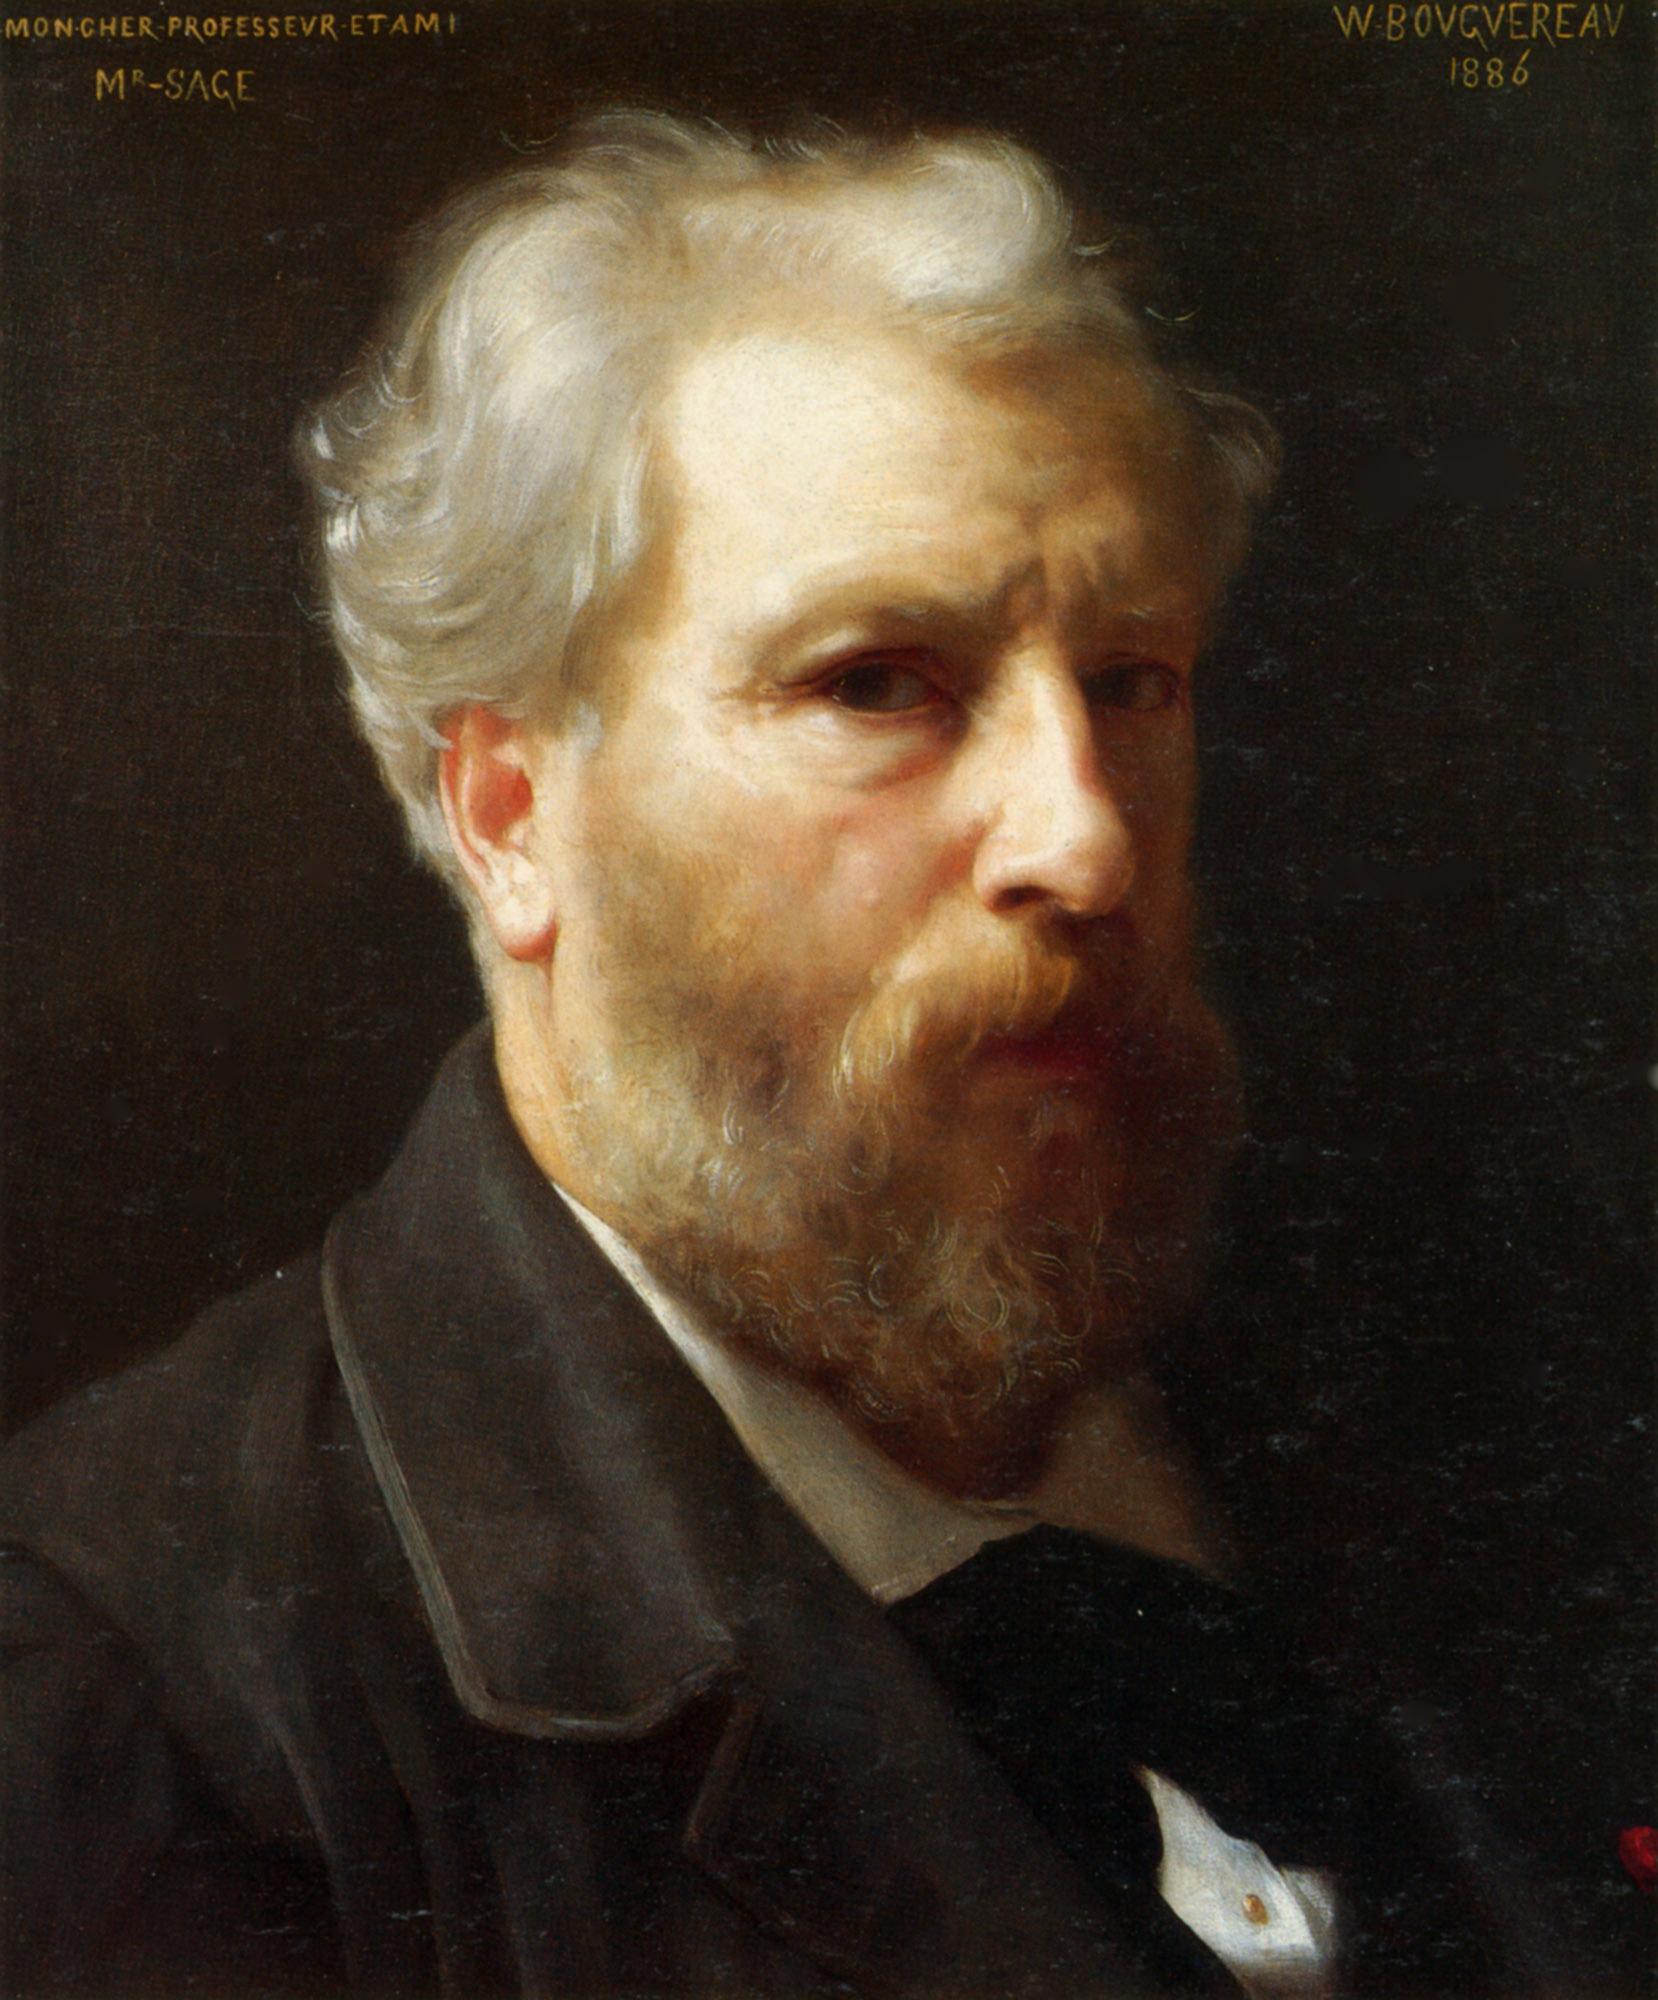 William-Adolphe_Bouguereau_(1825-1905)_-_Self-Portrait_Presented_To_M._Sage_(1886)